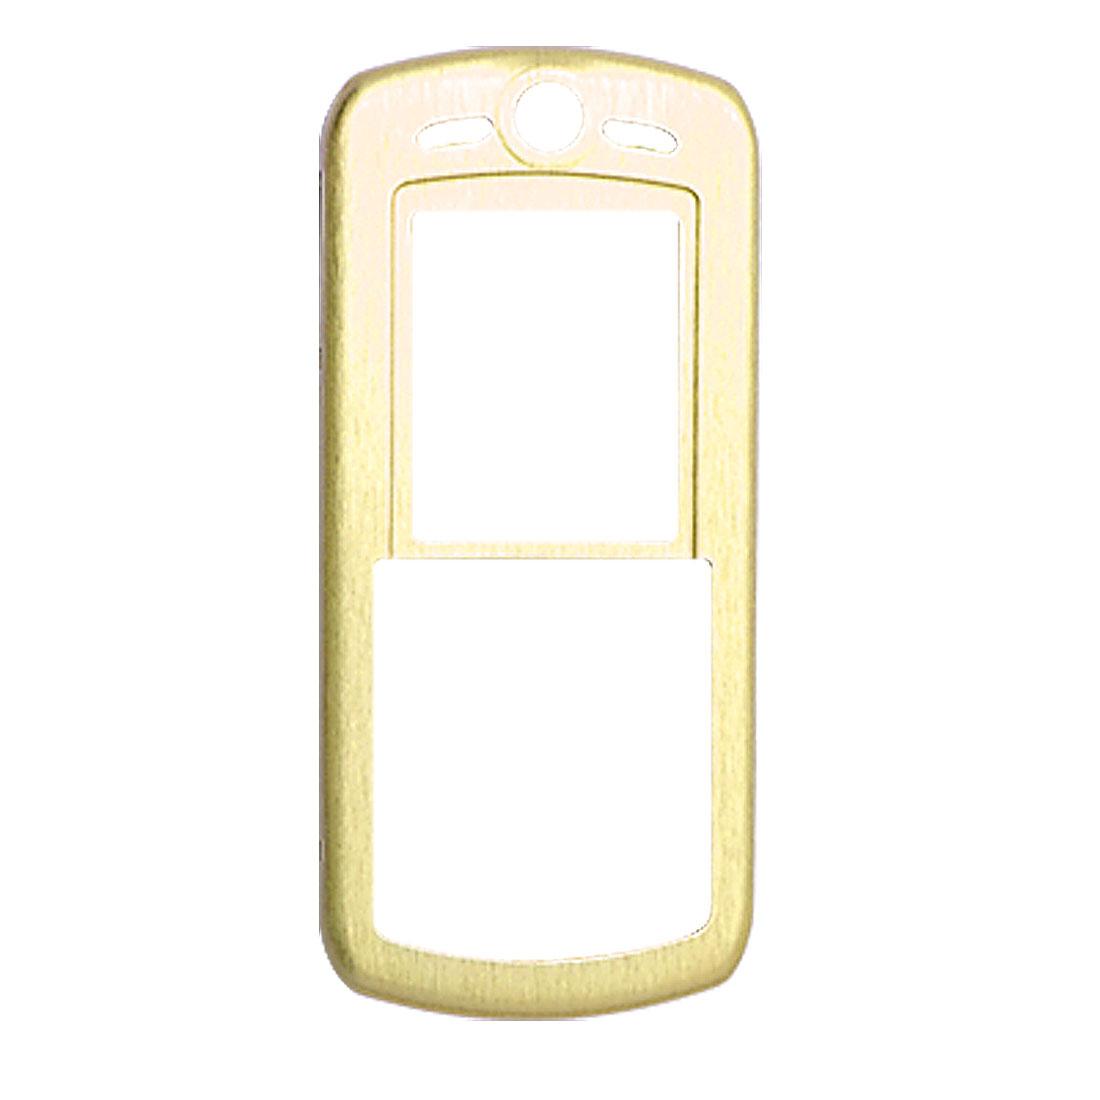 Slim Aluminum Metal Case Skin for Motorola L9 Golden